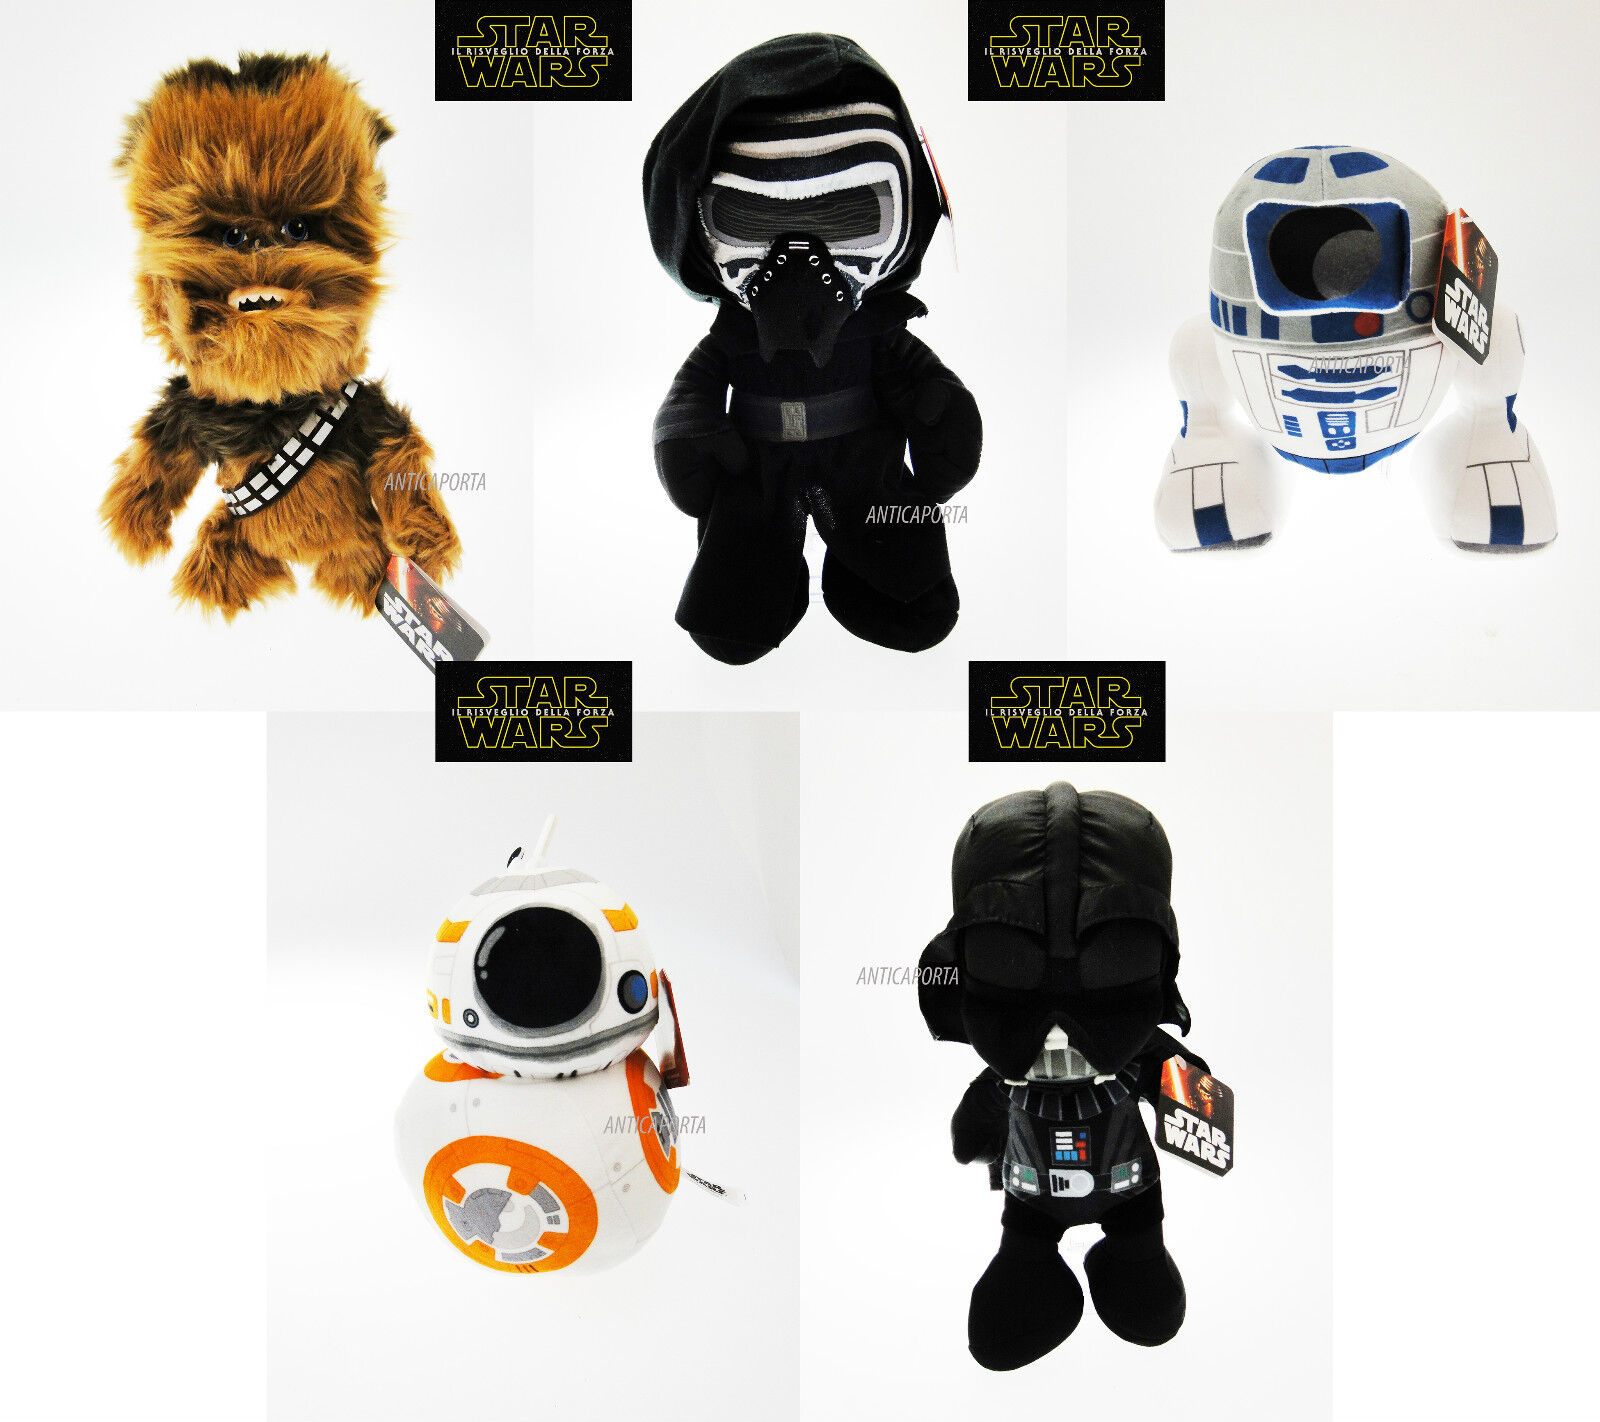 Soft toy Star Wars Original Kilo R2-D2 Chewbacca Darth Dart Vader BB-8 2016